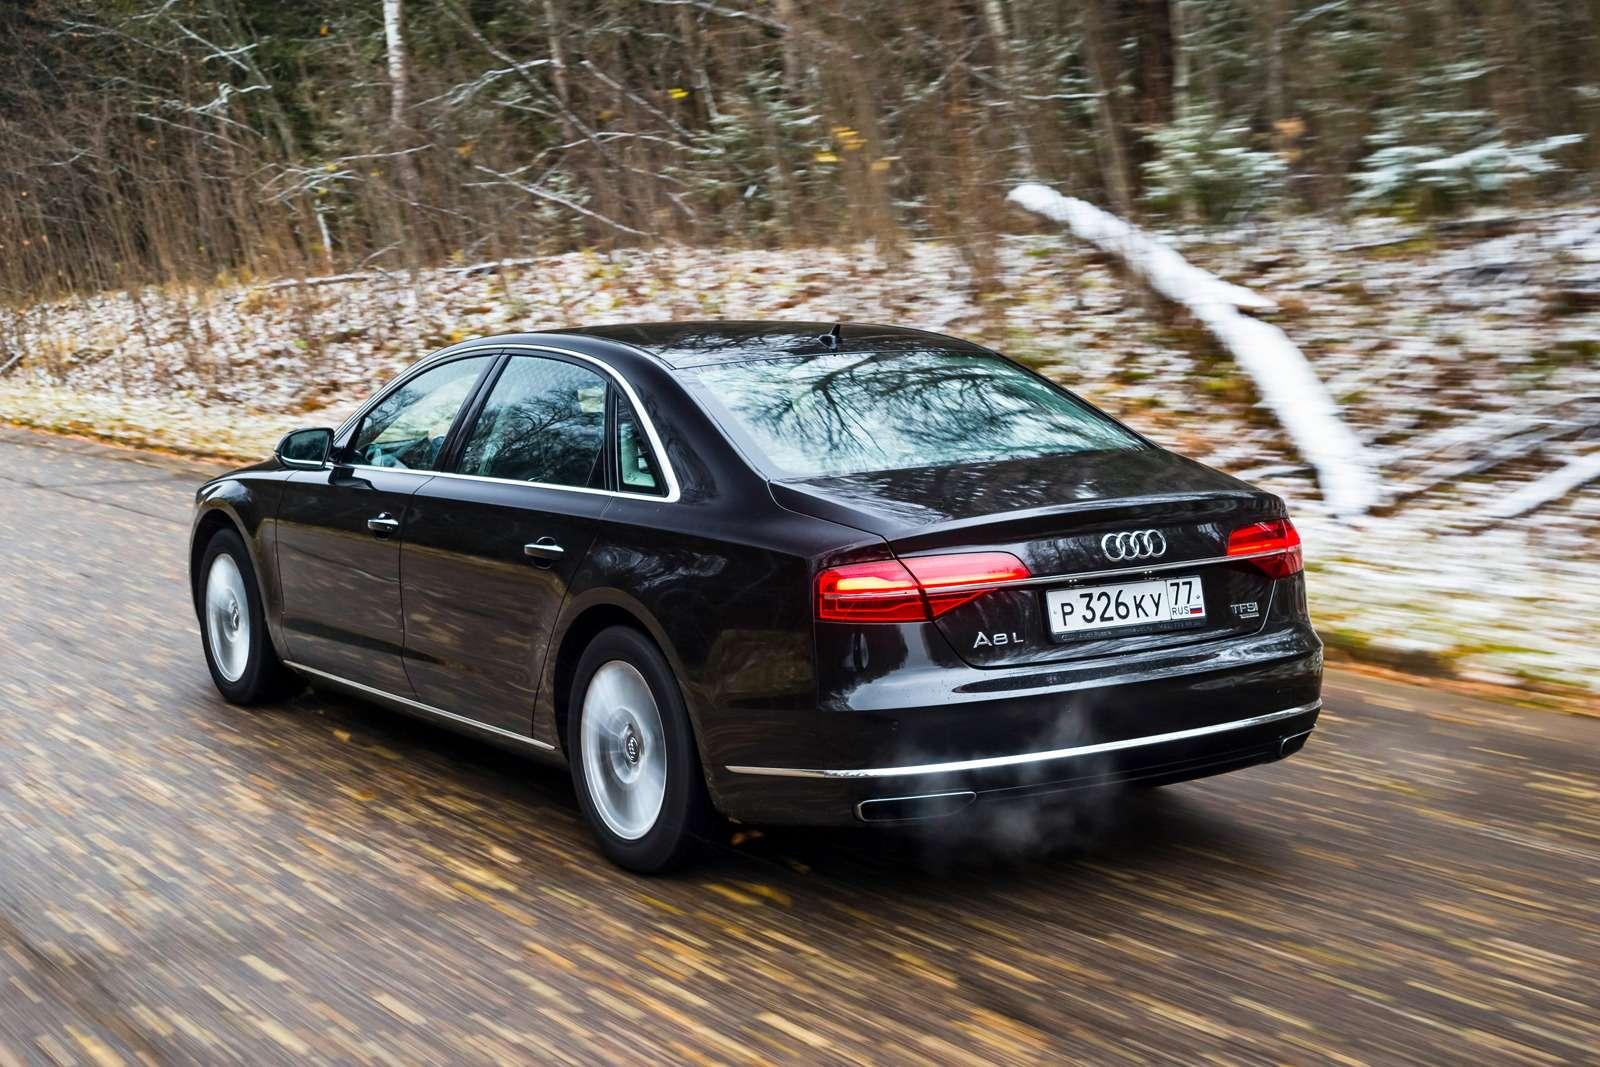 01-Audi_zr-01_16